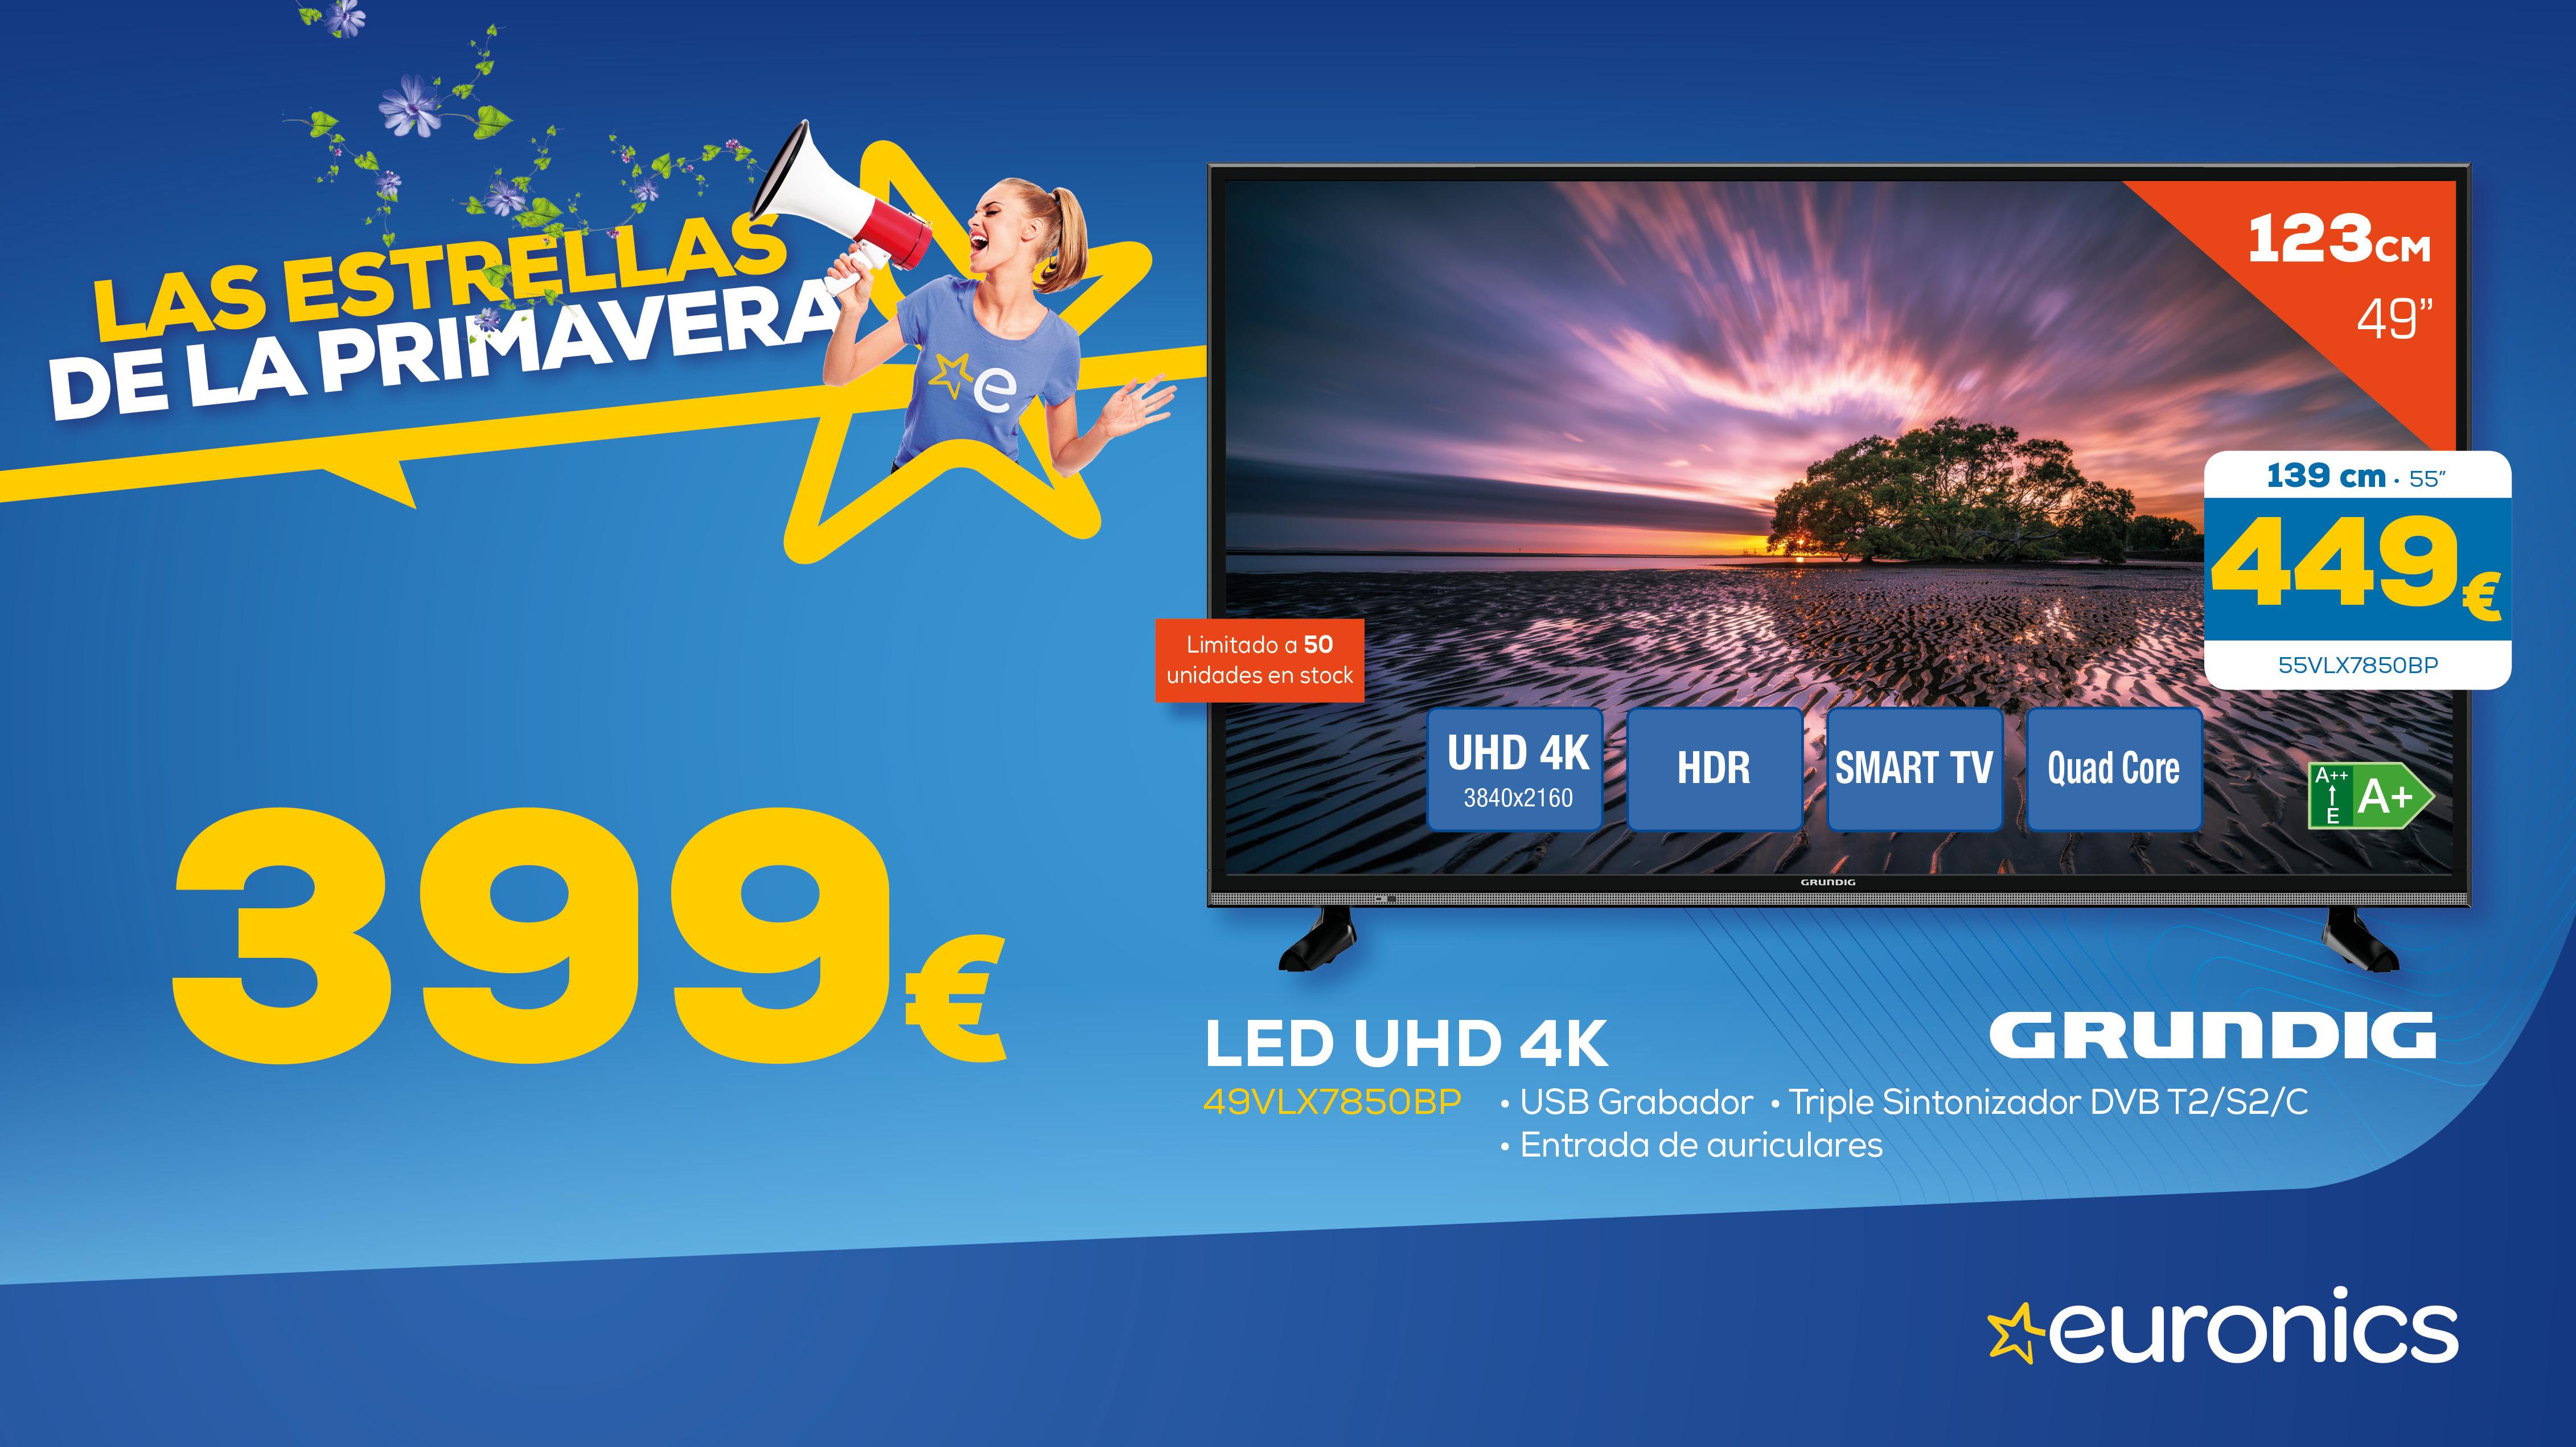 Telvisor Grundig Led UHD 4 K 449€